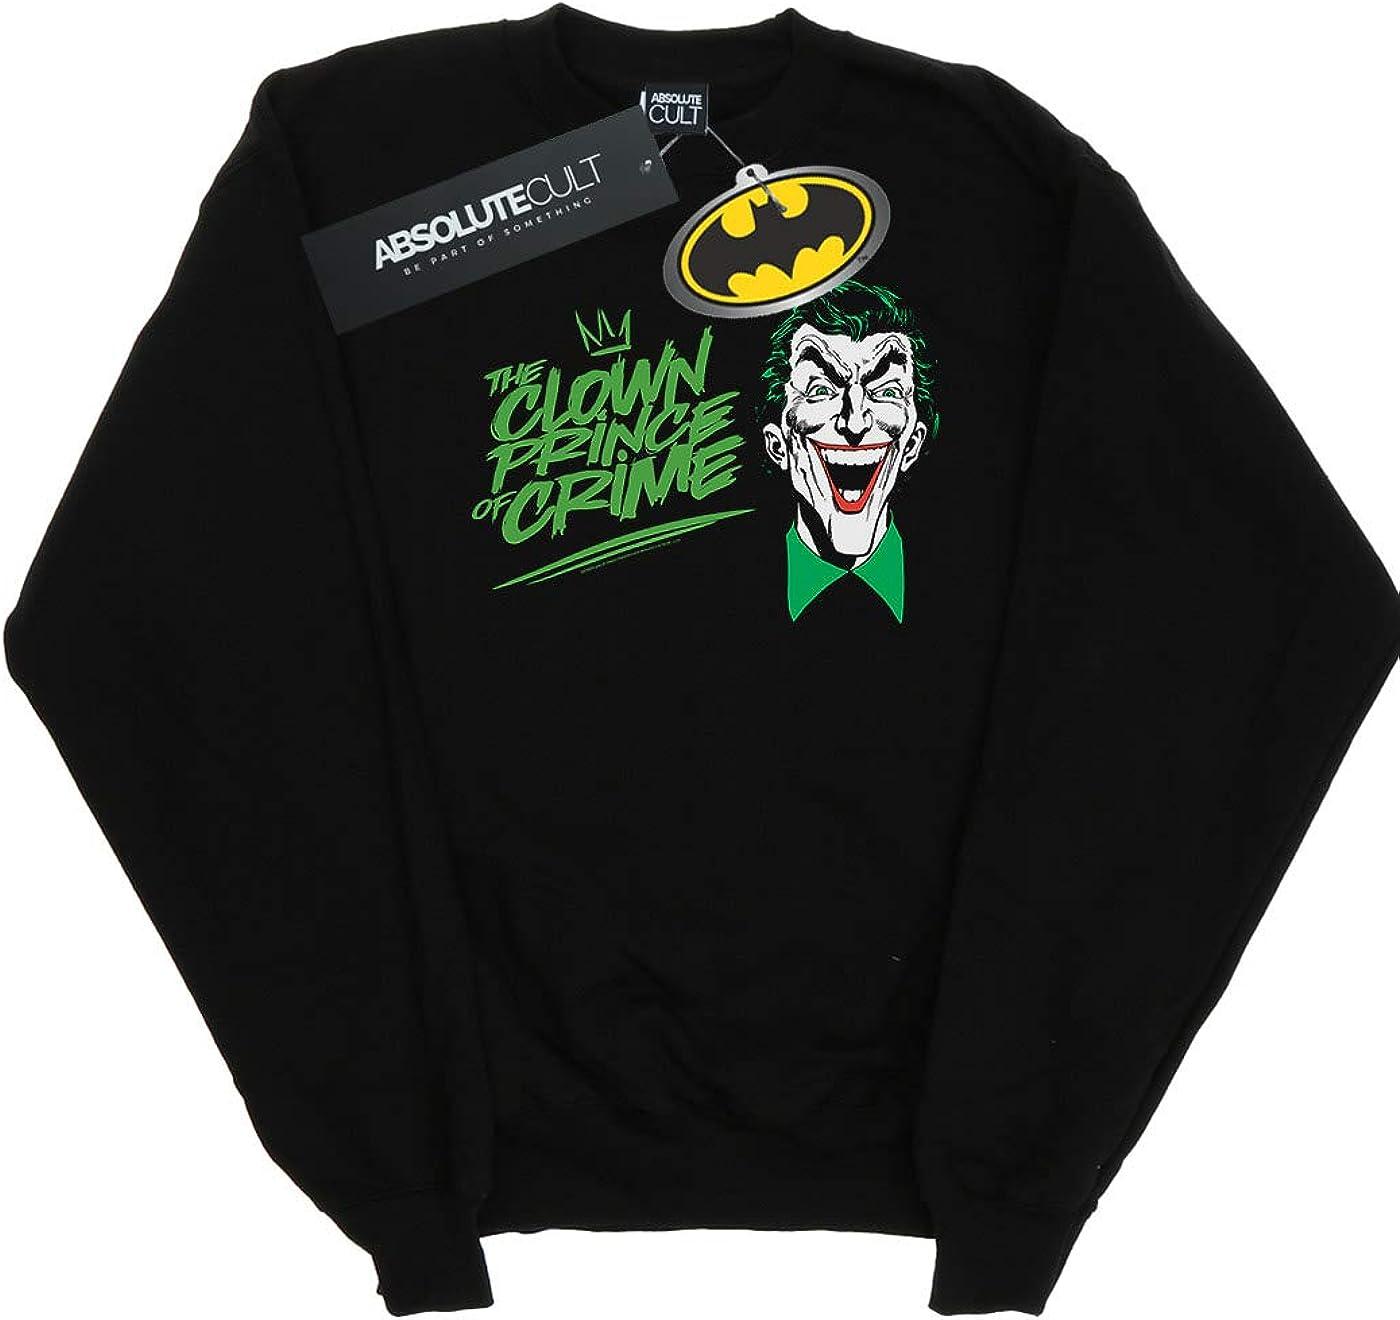 DC Comics Homme Batman Joker The Clown Prince of Crime Sweat-Shirt Noir